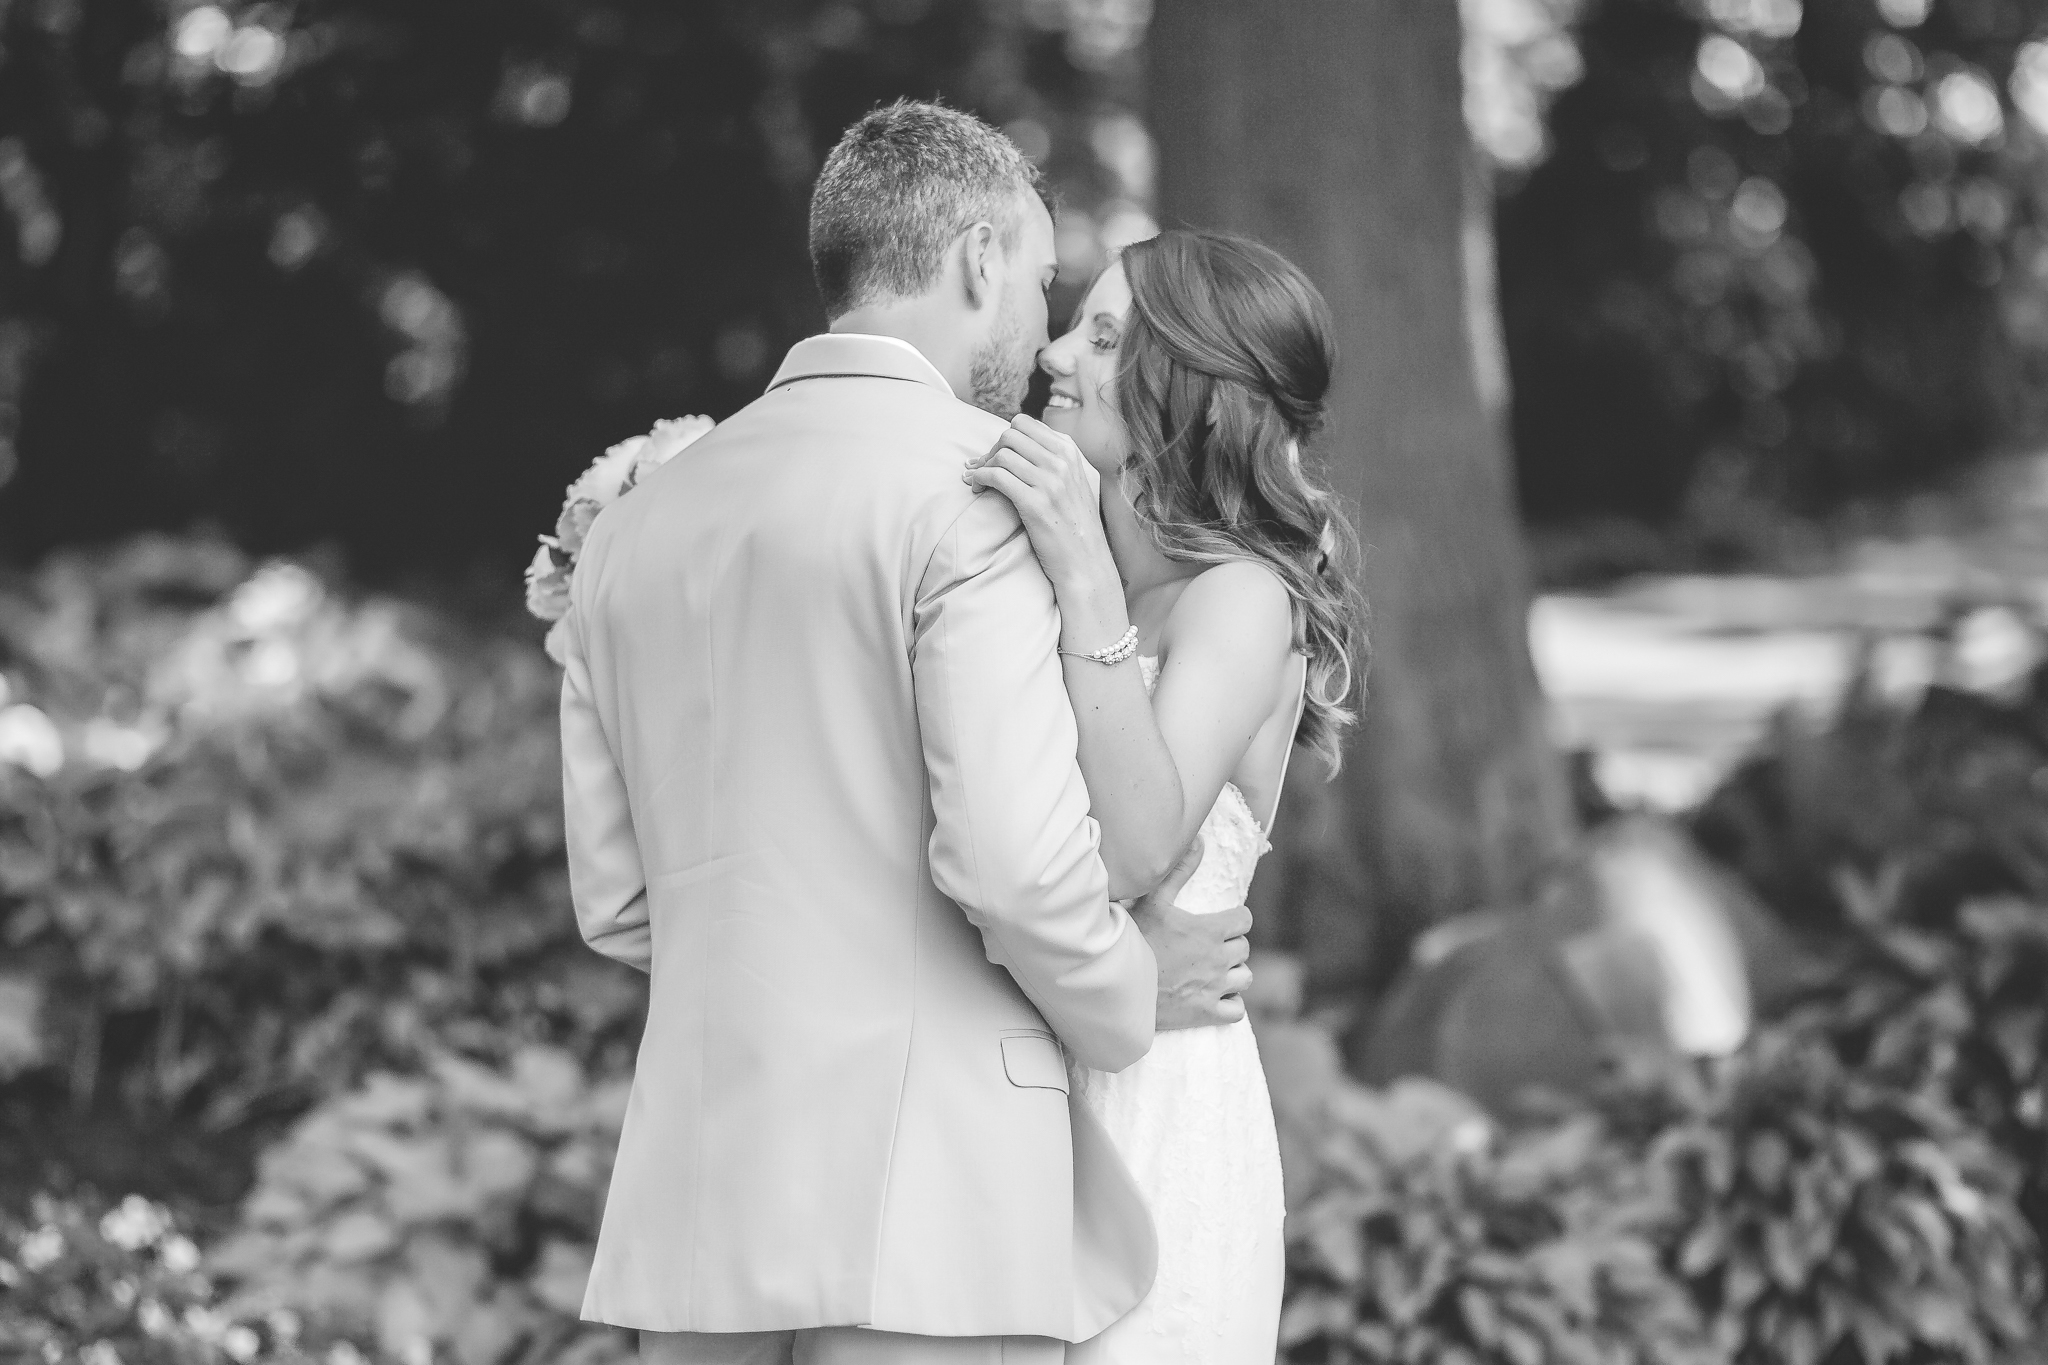 minneapolis wedding photographer-4.jpg